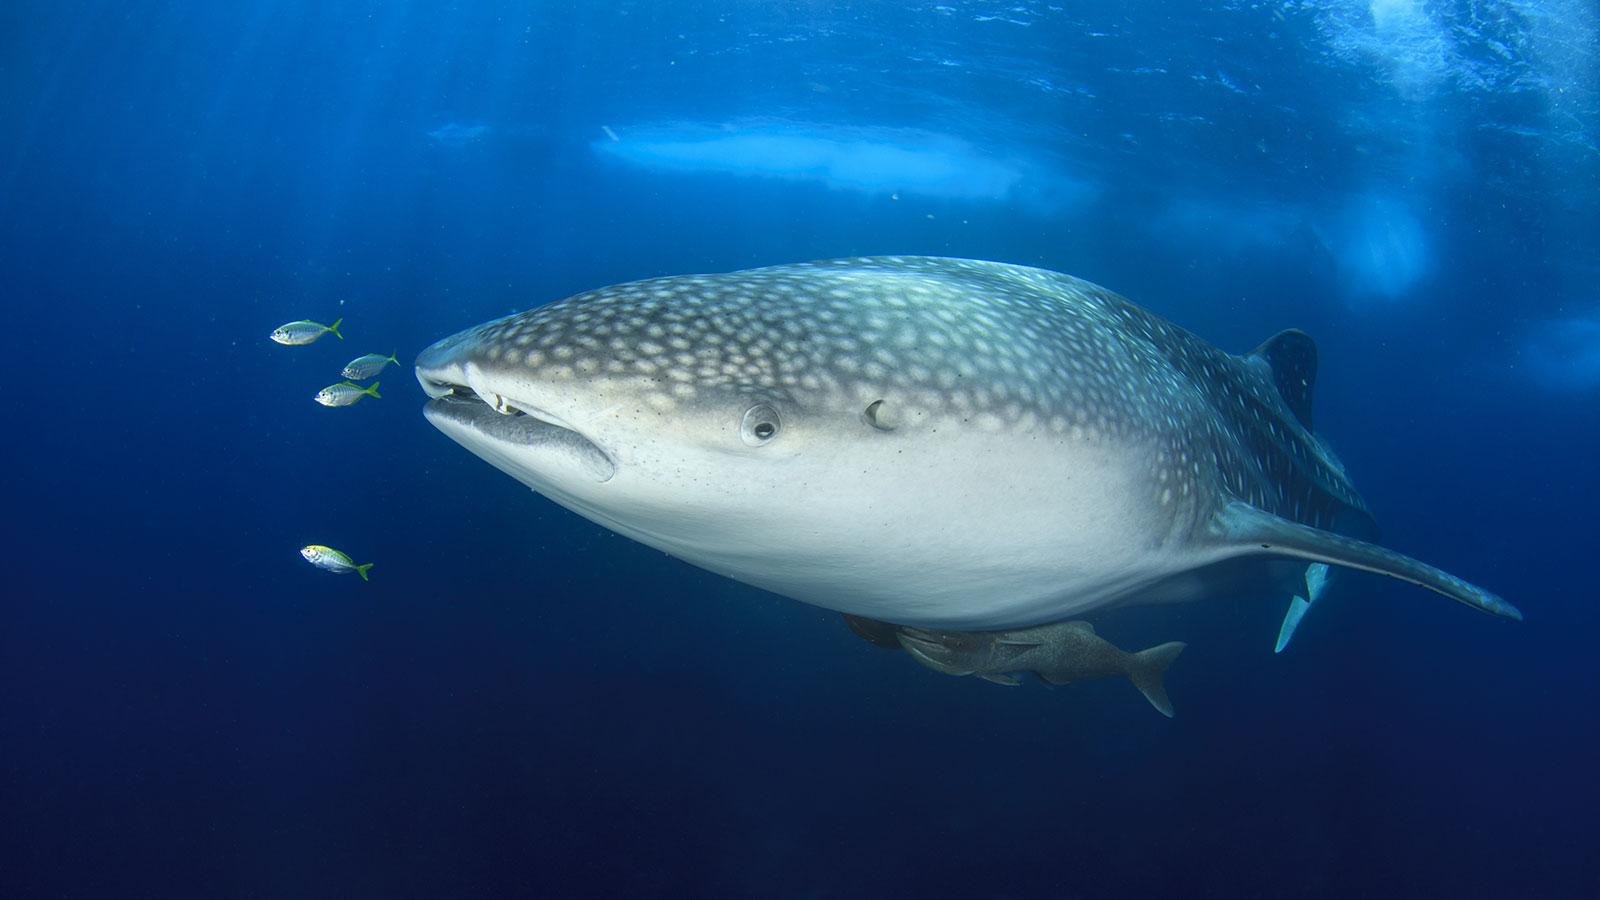 Maldives Resorts - Unforgettable dive experience in Haa Alifu - Hideaway Maldives Beach Resort & Spa